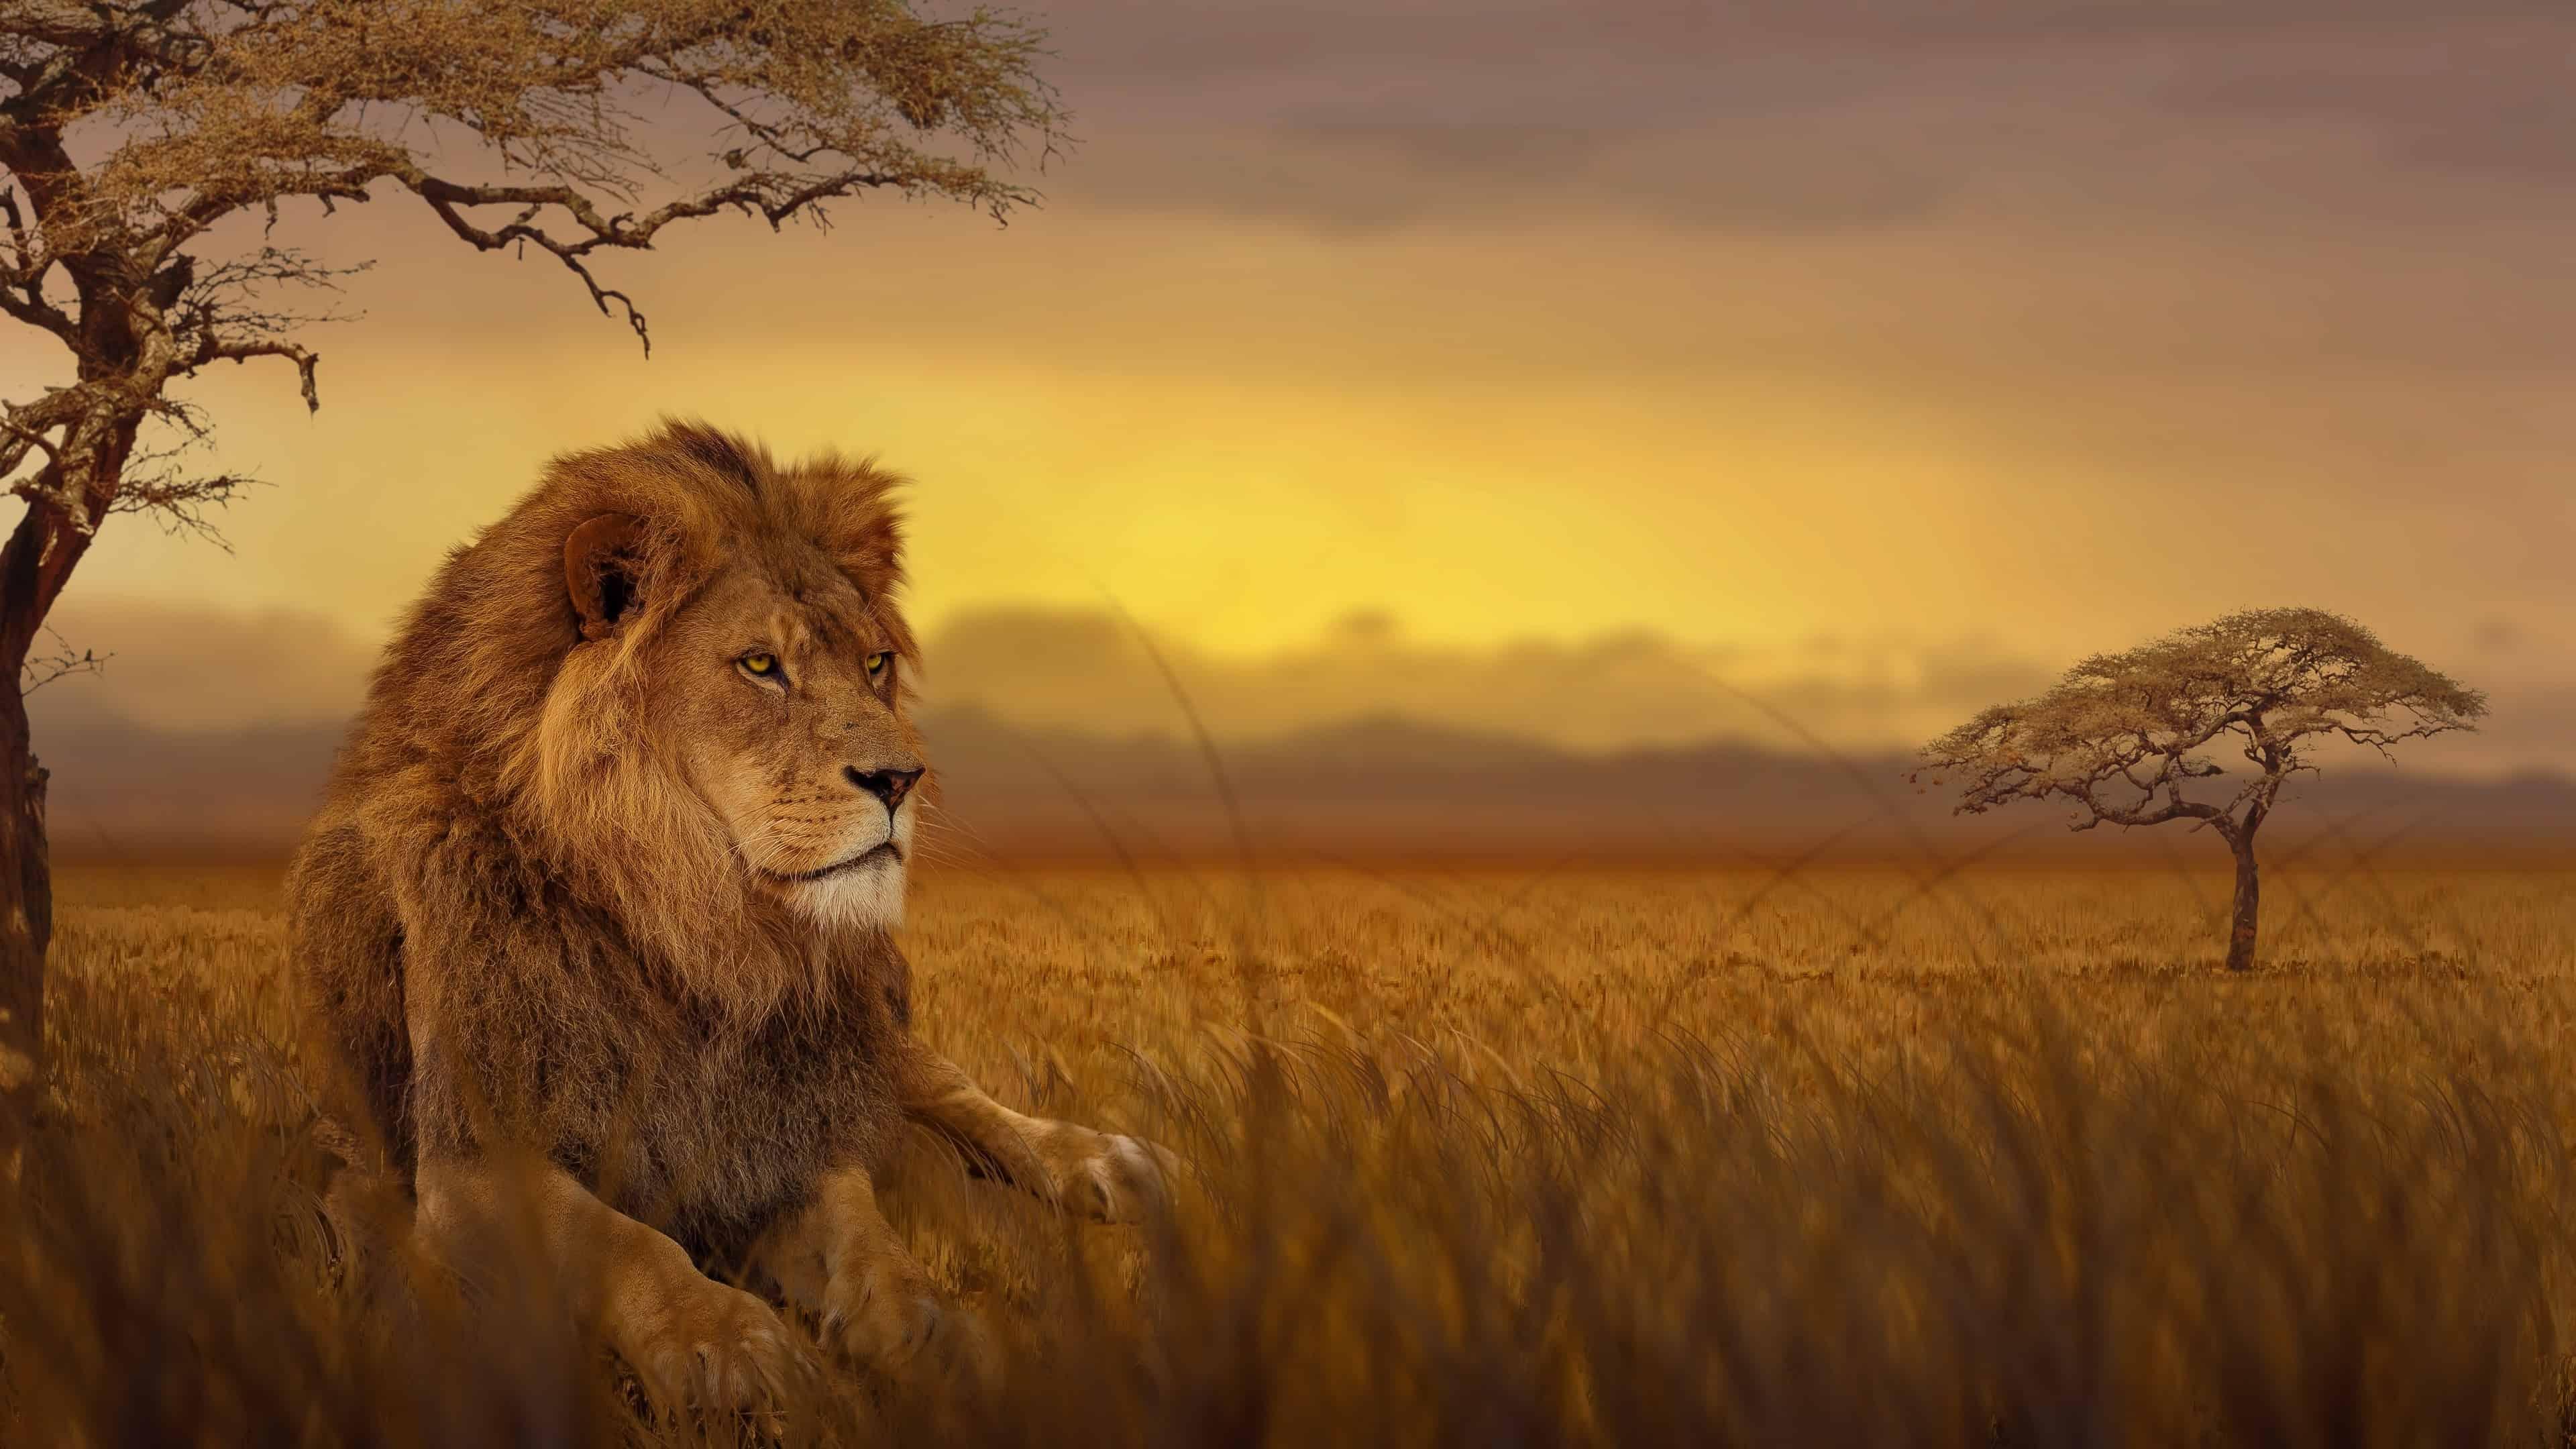 lion african savannah uhd 4k wallpaper